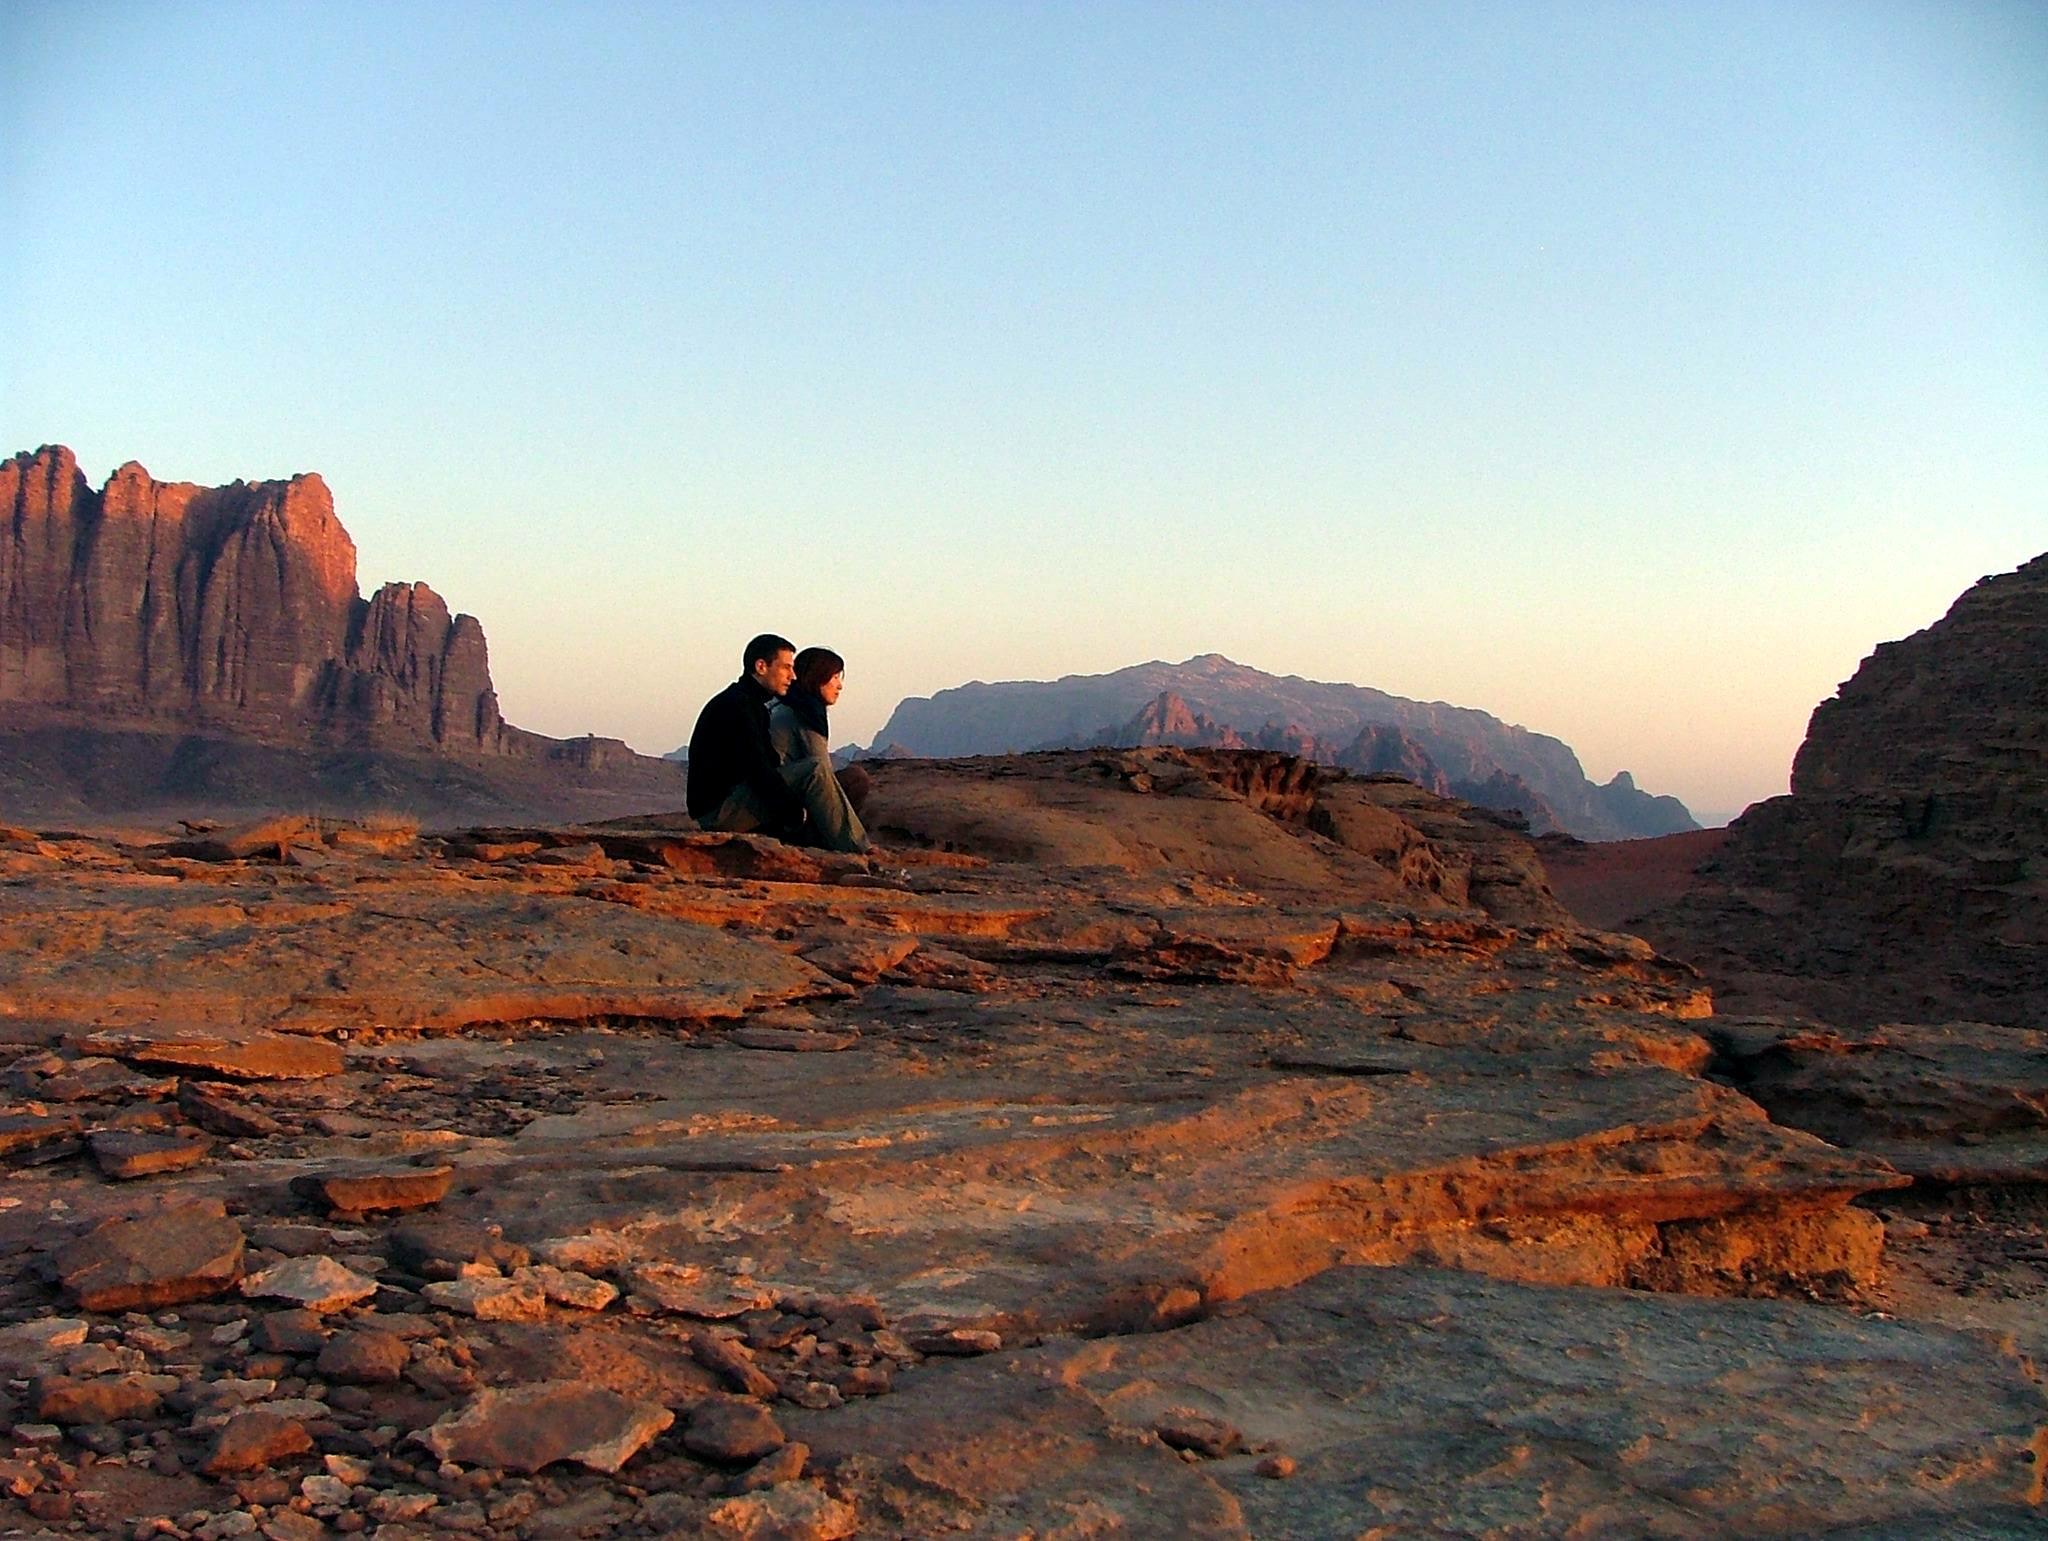 Sunrise in the Wadi Rum Jordan Rob Dyer The Real Japan